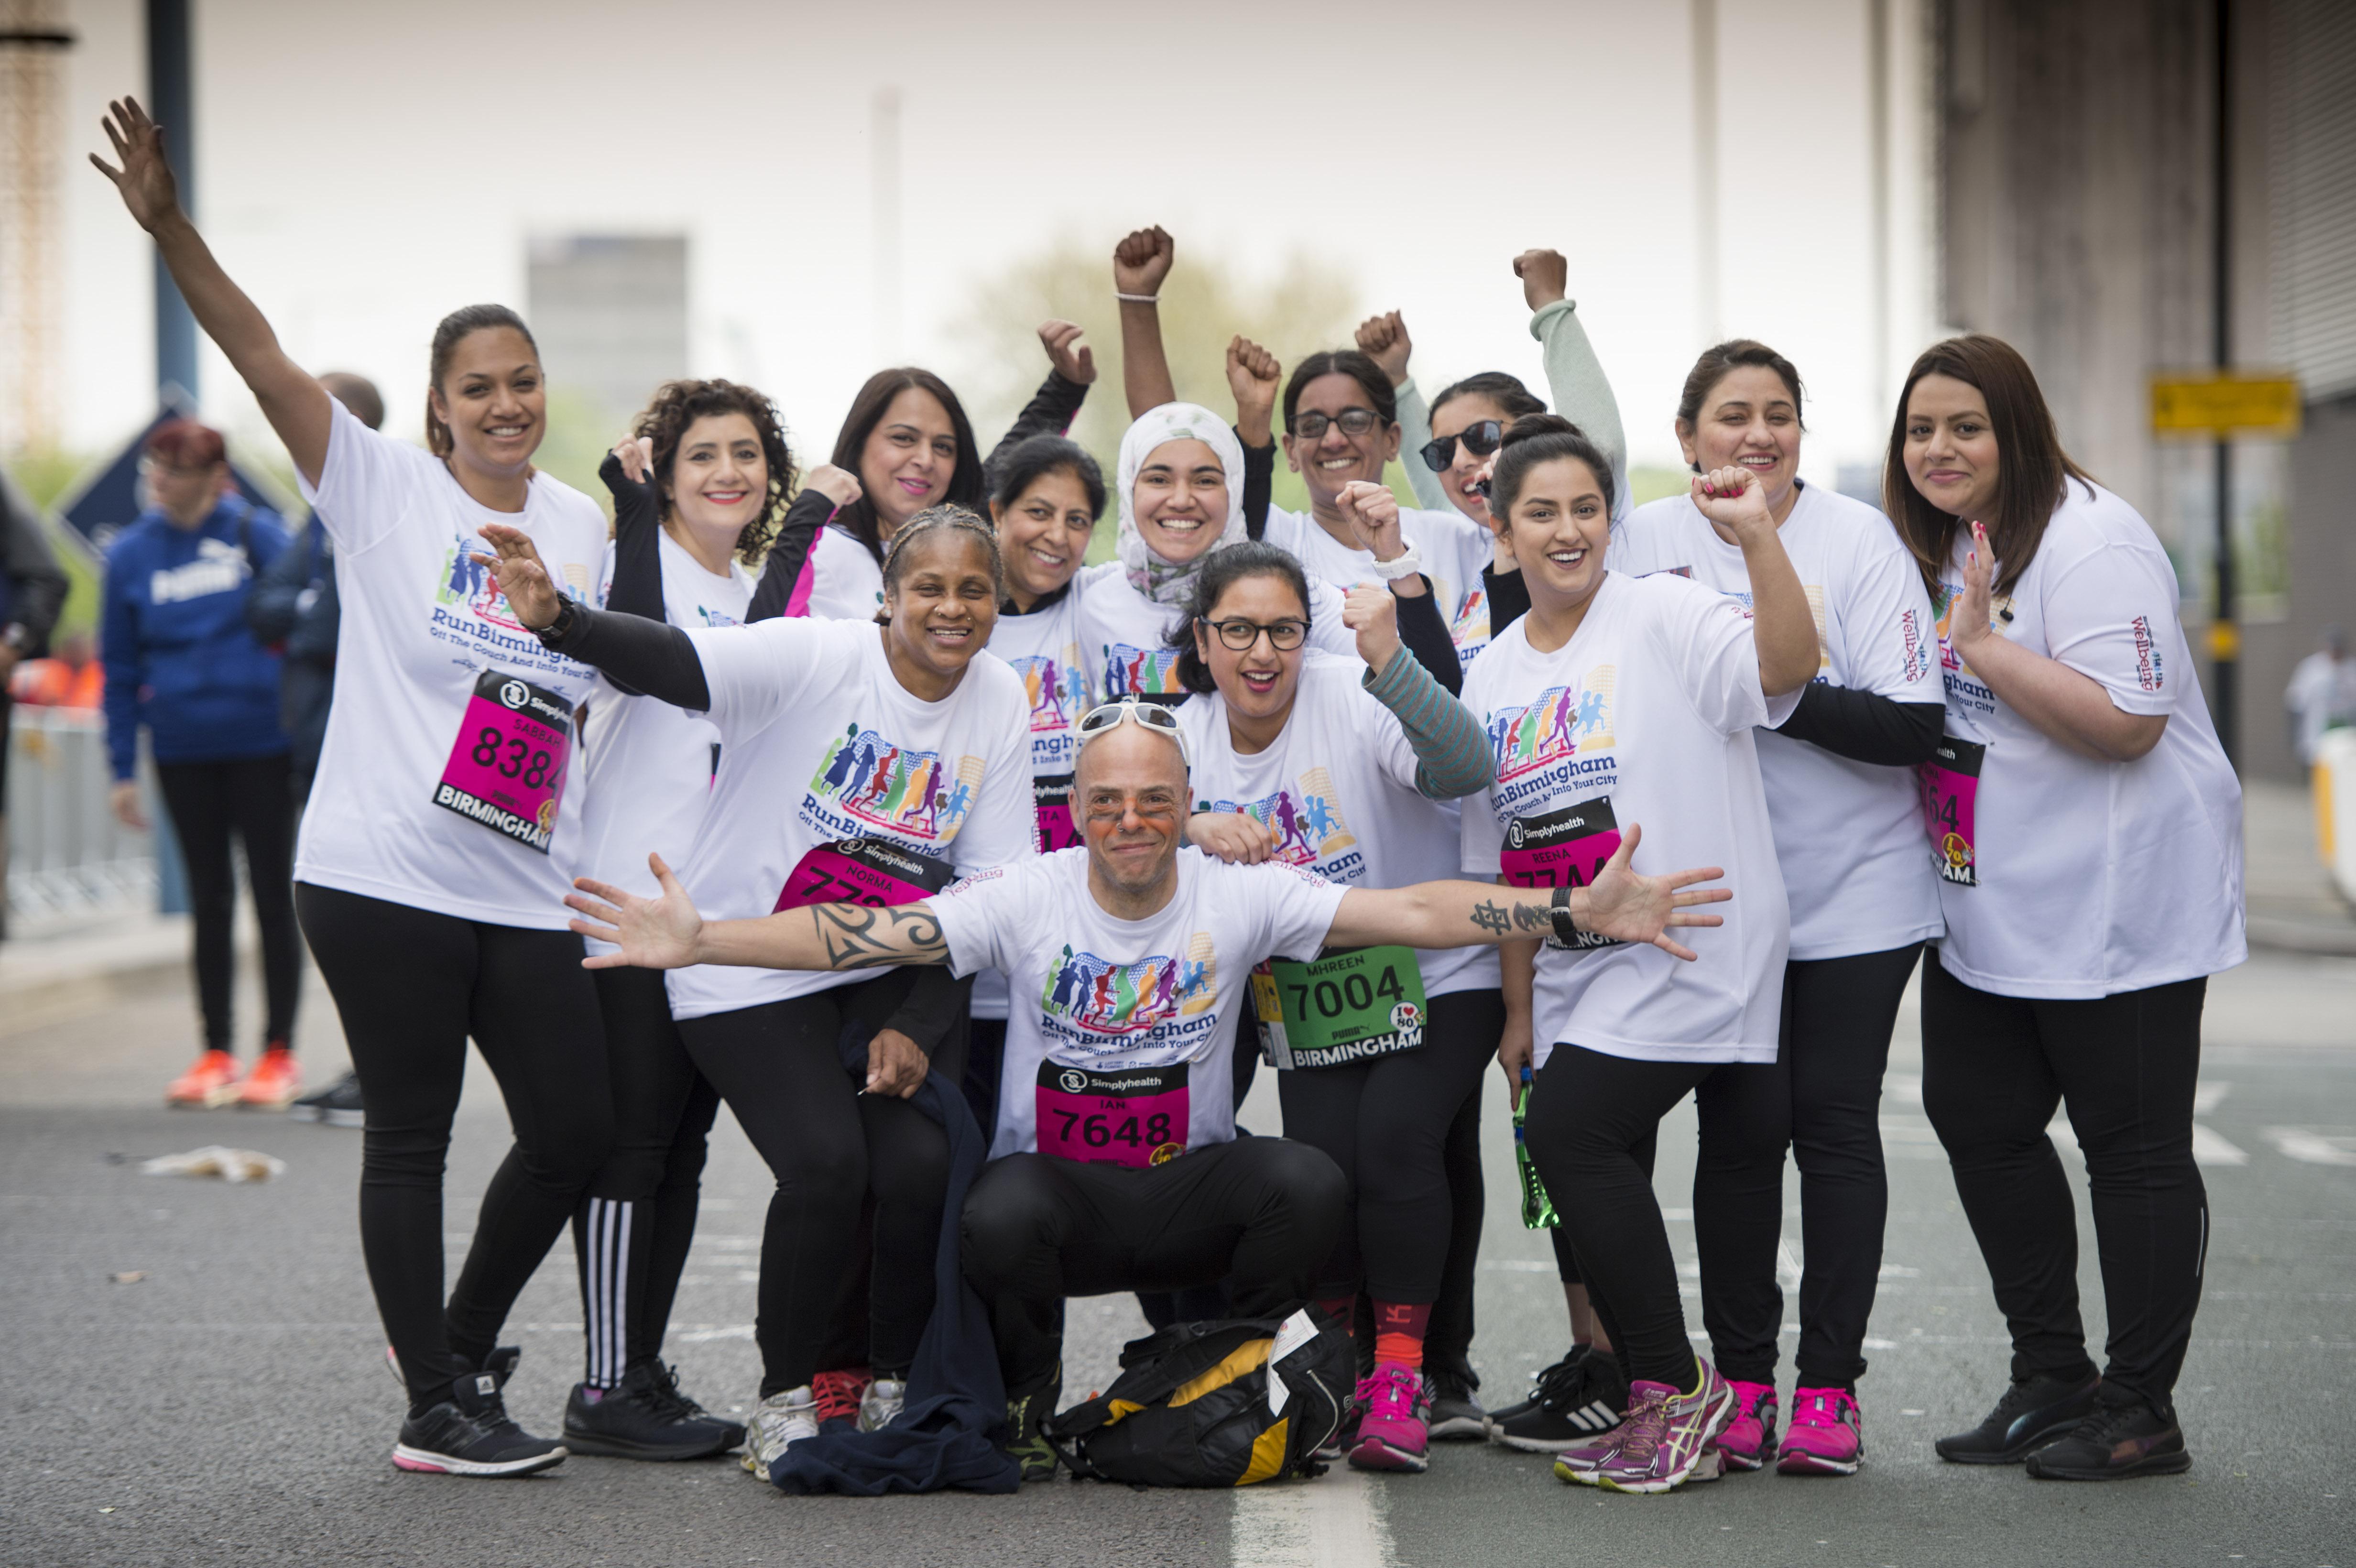 Award-winning Naseem helps cement Great Birmingham Run's diversity